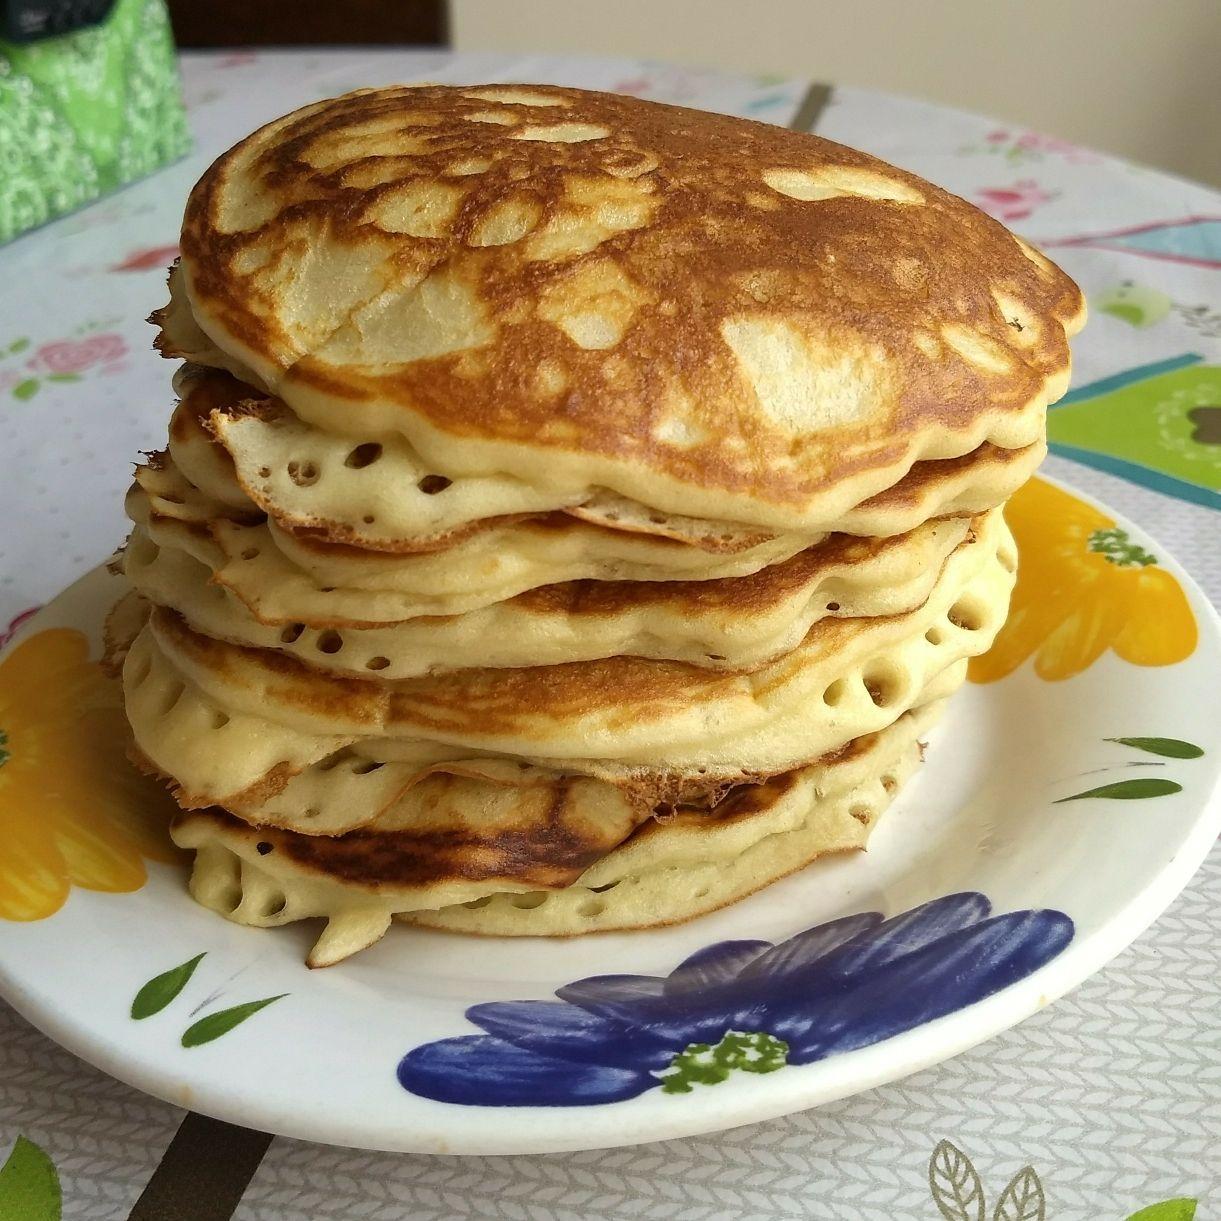 Panqueca americana (american pancake)